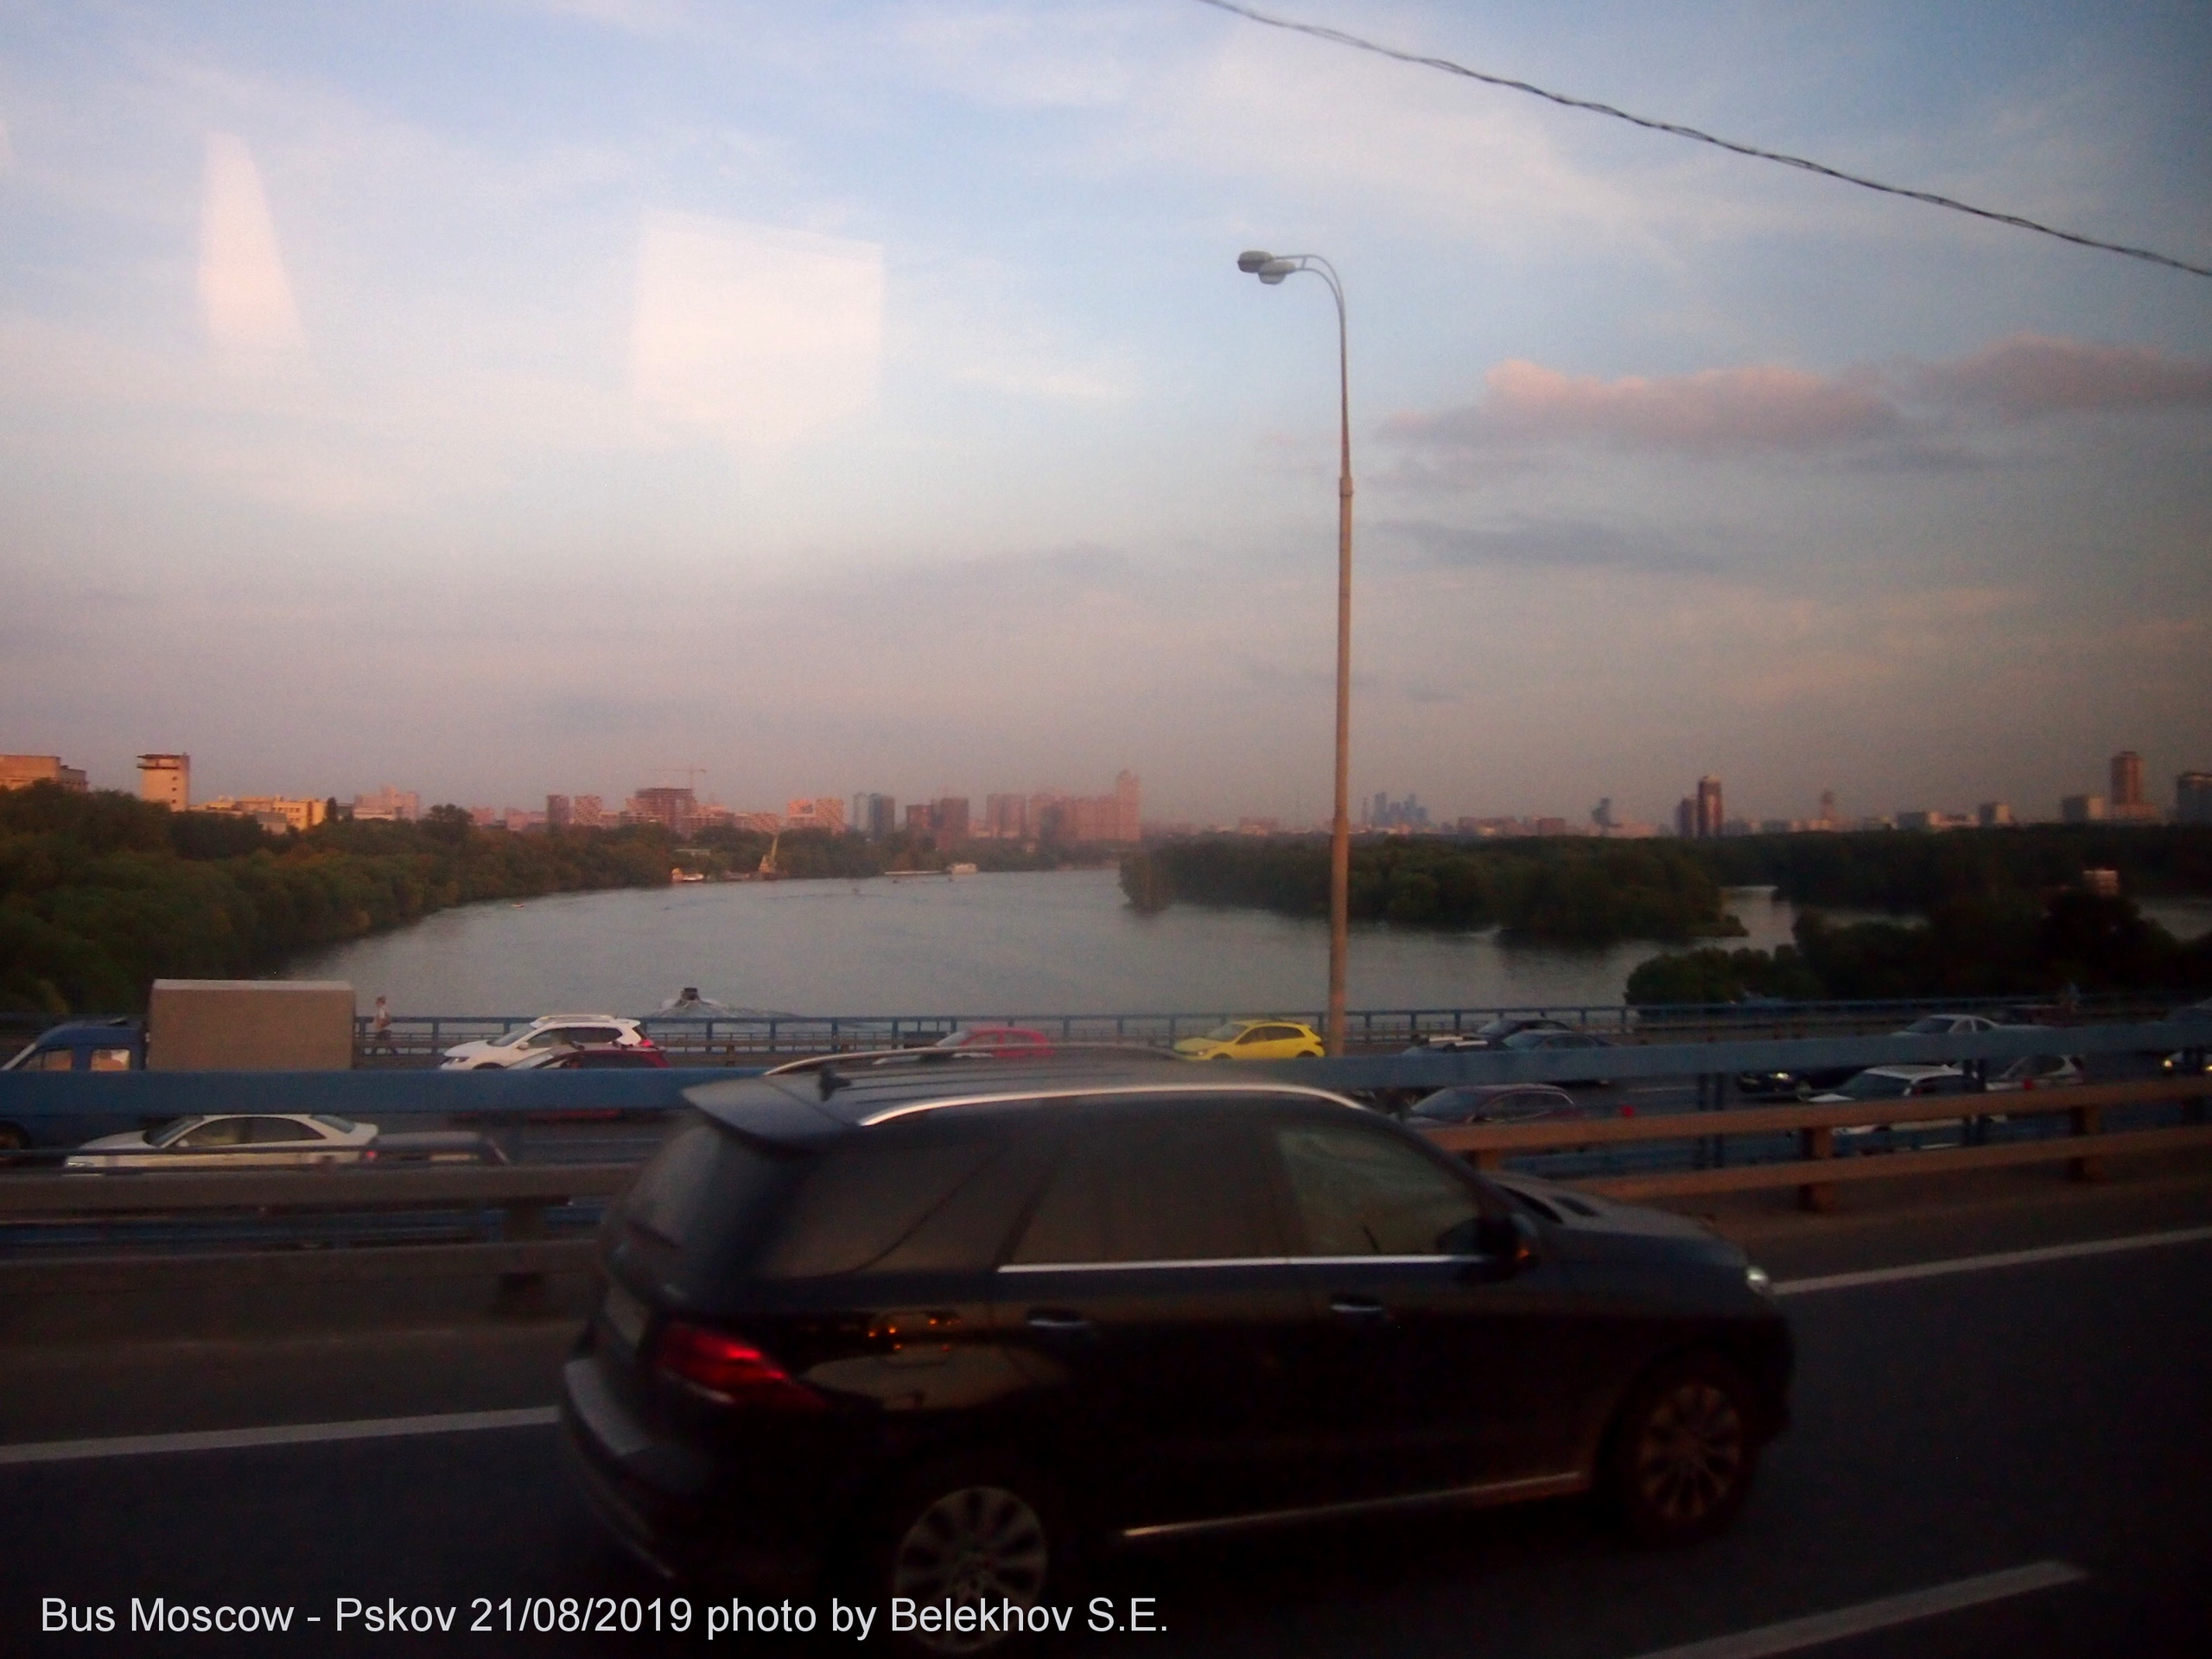 Москва - Великие Луки, сквозь стекло